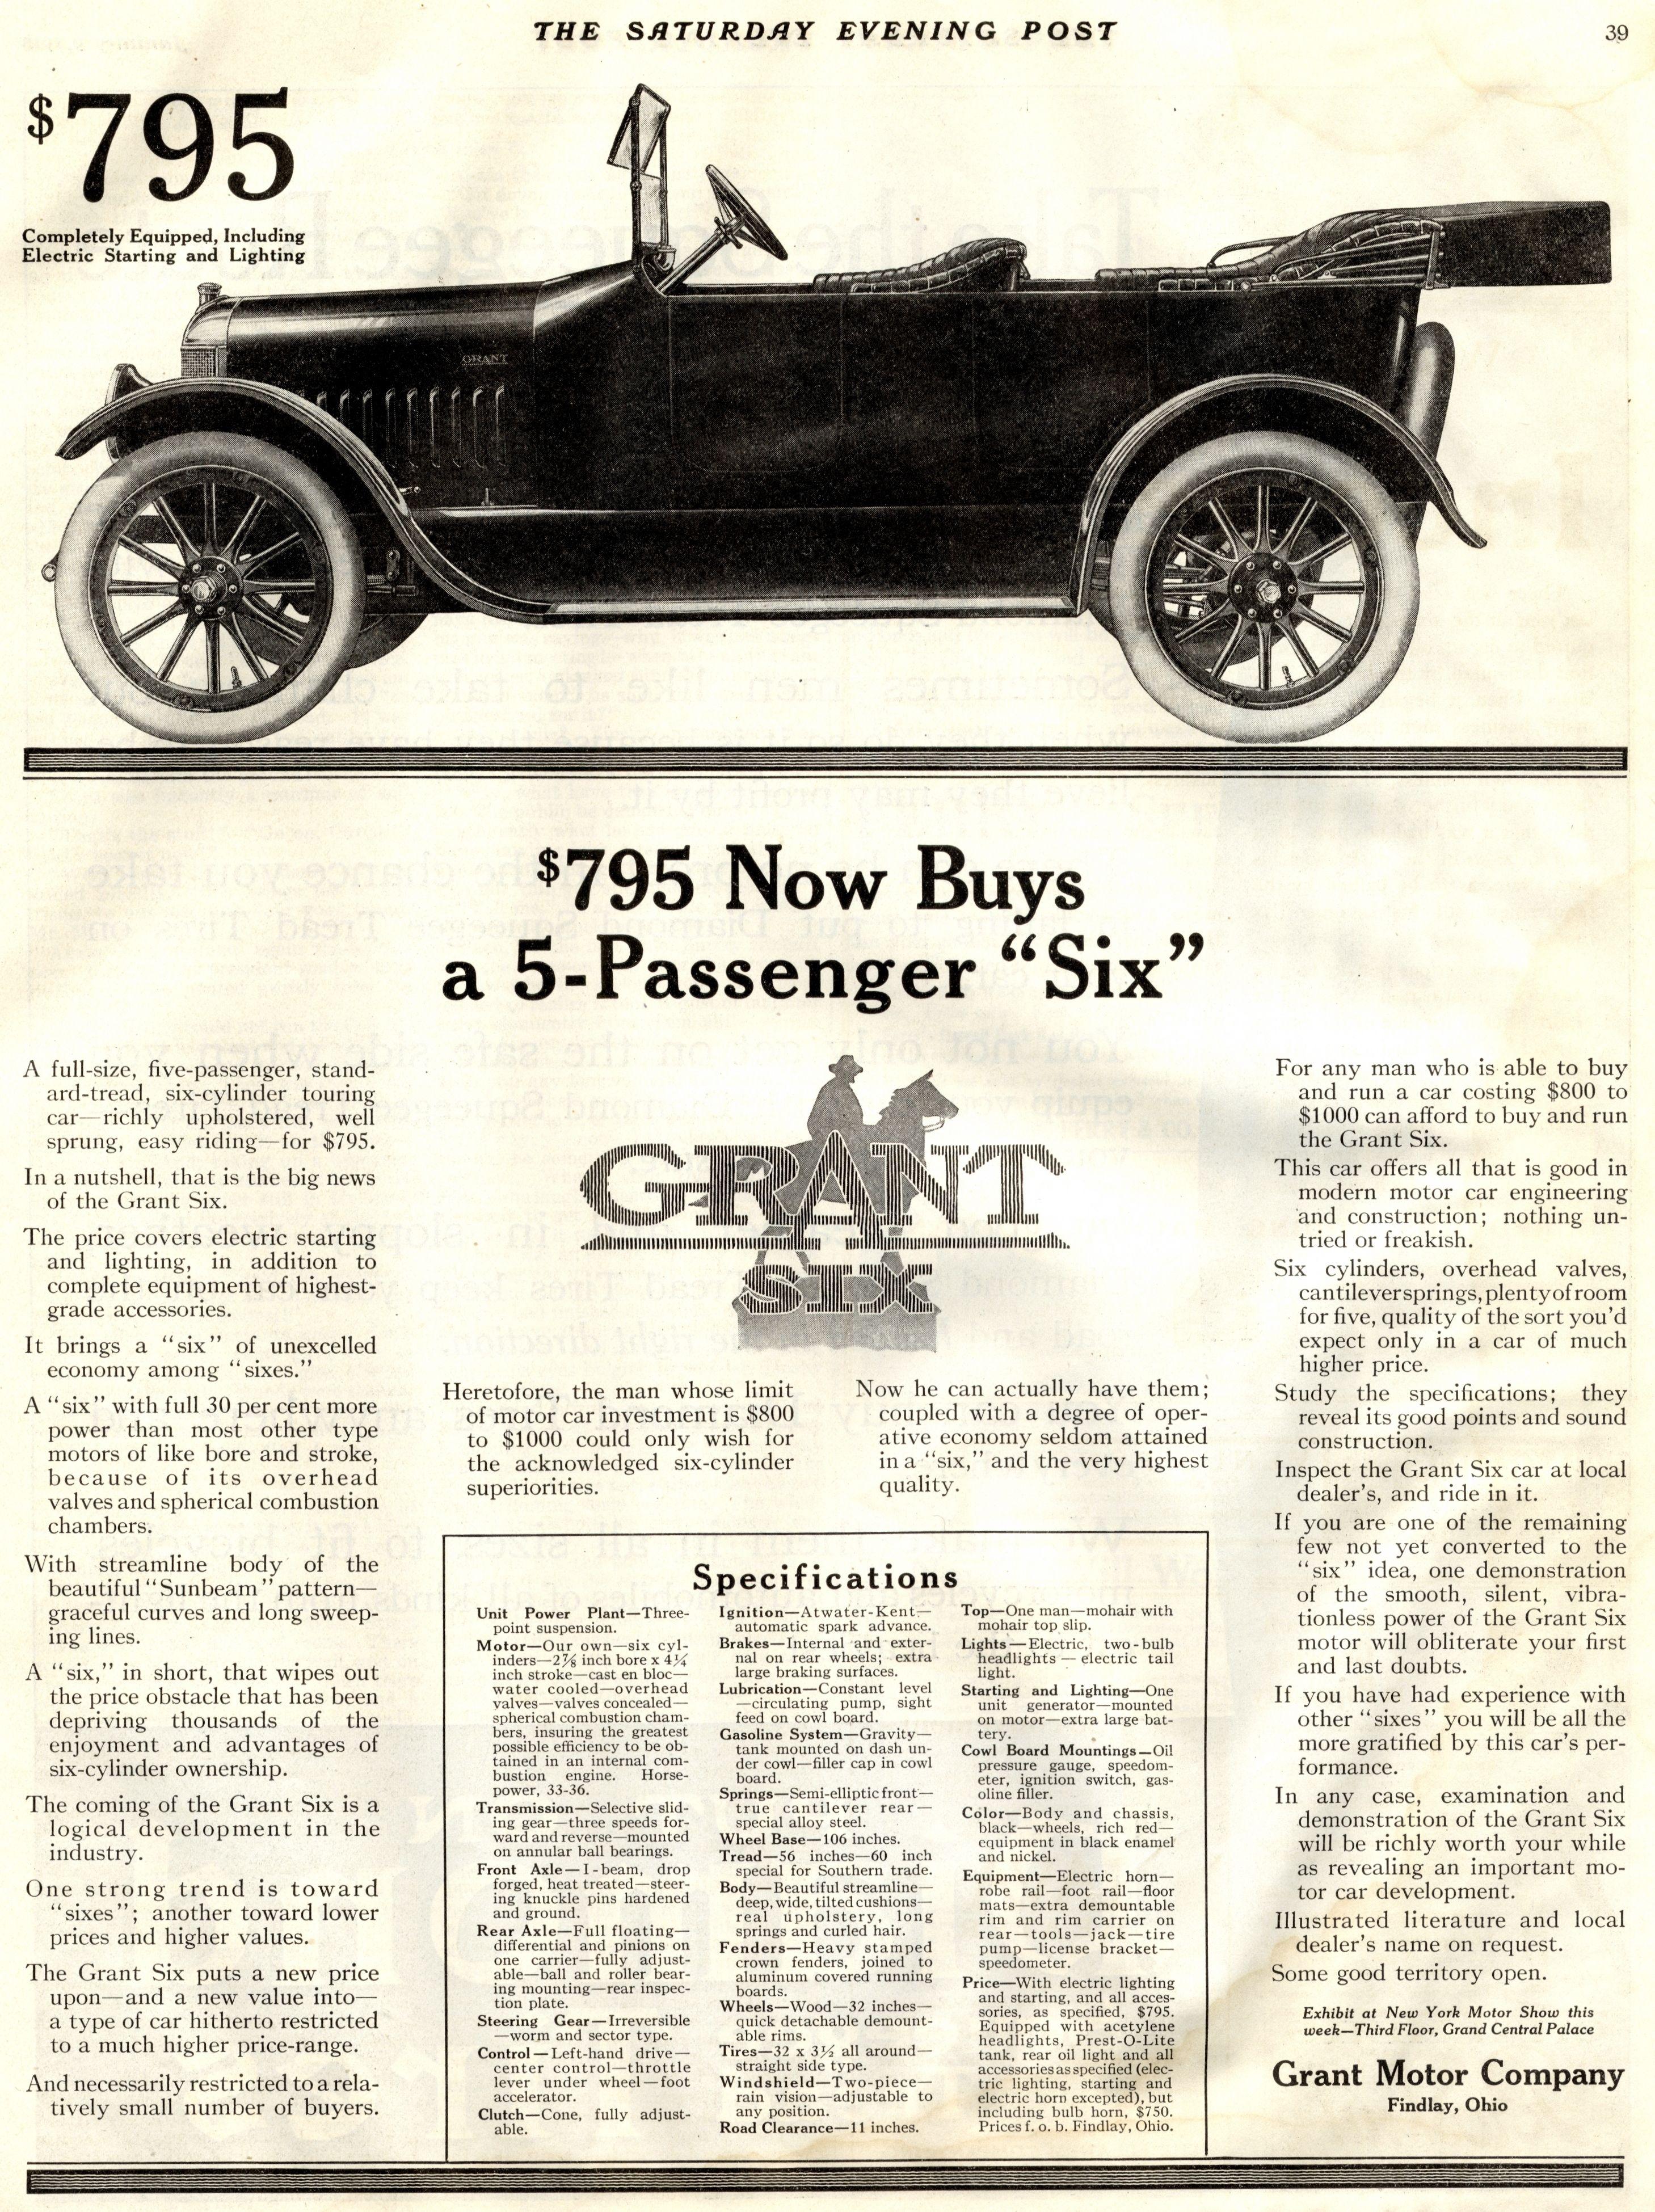 Grant The Saay Evening Post January 9 1915 Findlay Ohio Car Advertising